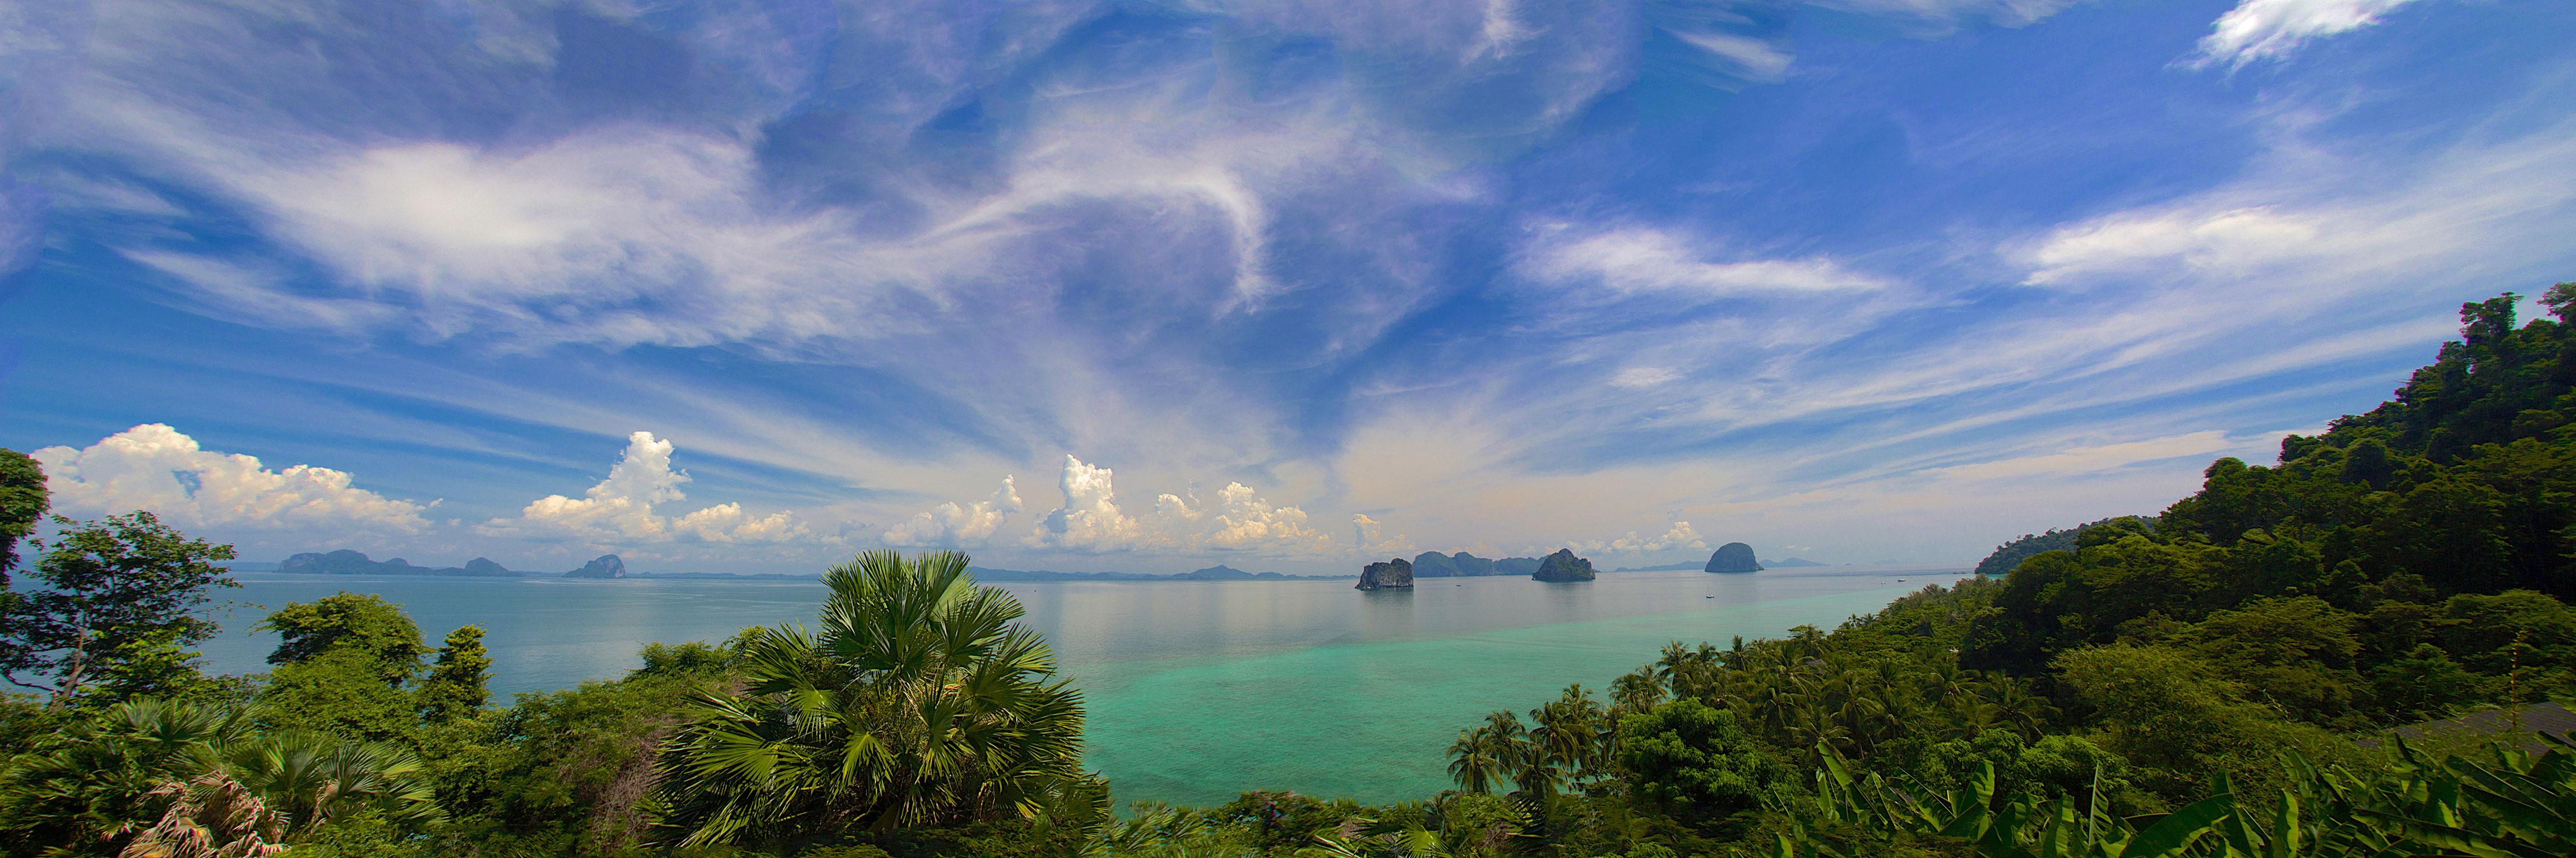 Panorama vom Berg auf das blaue Meer vor Koh Ngai / Koh Hai in Thailand/Krabi